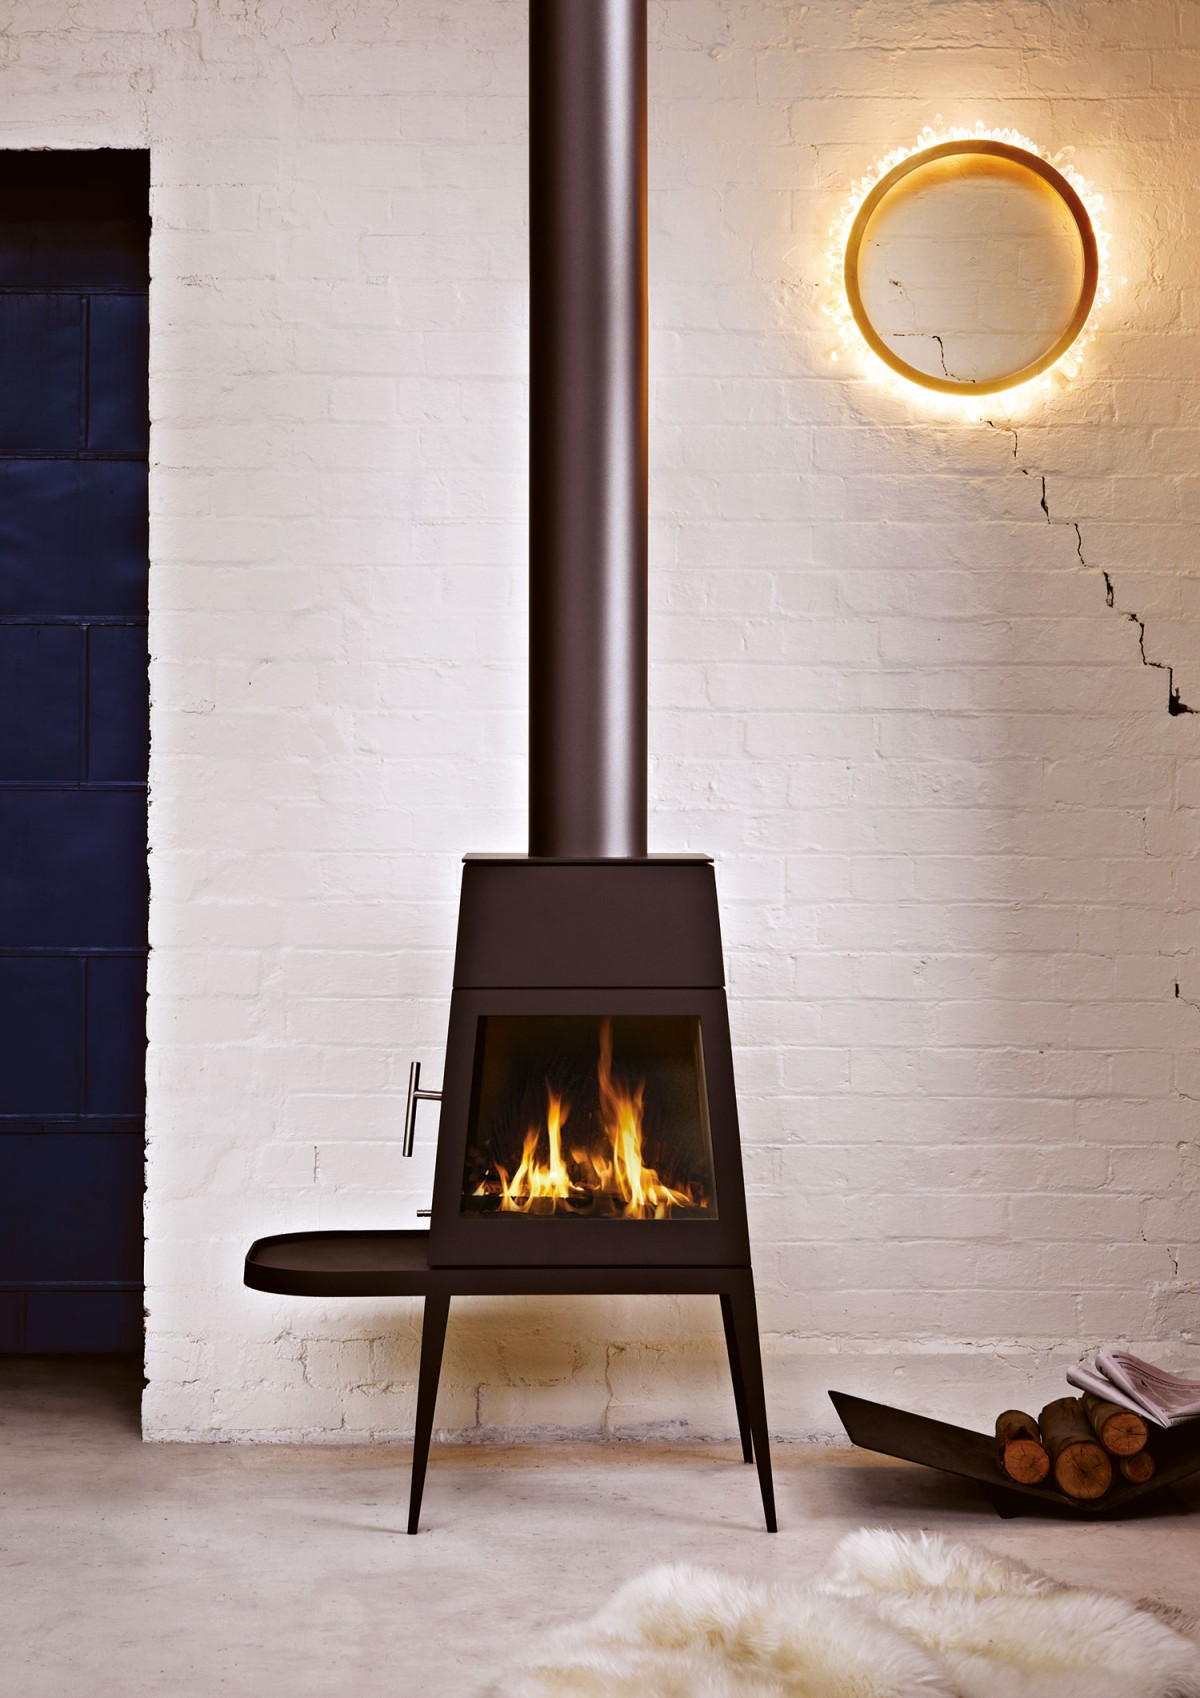 Shaker Fireplace Beautiful Shaker Wood Stove by Antonio Citterio